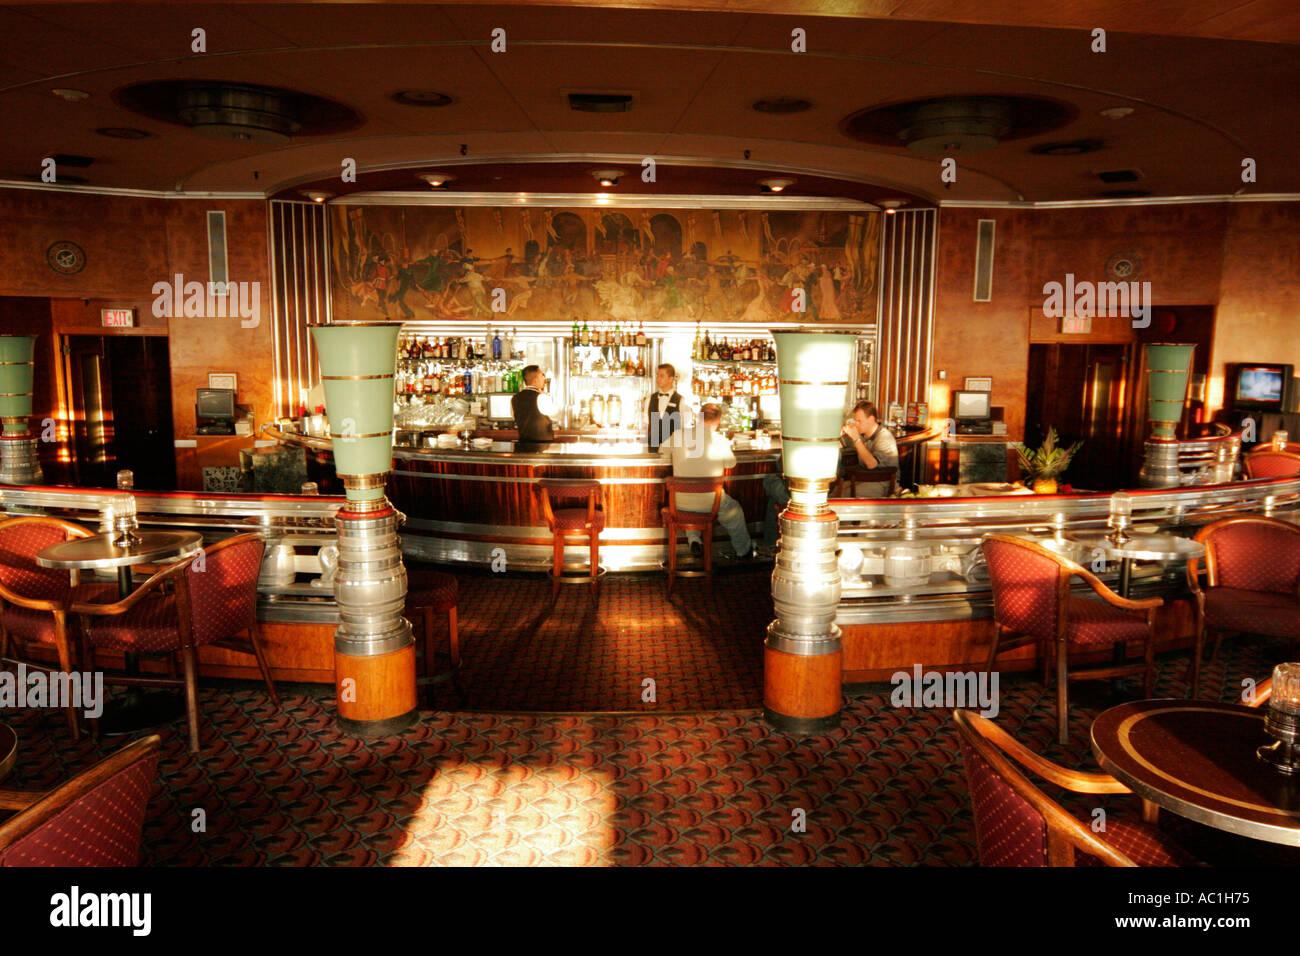 Lounge Bar Stockfotos & Lounge Bar Bilder - Alamy